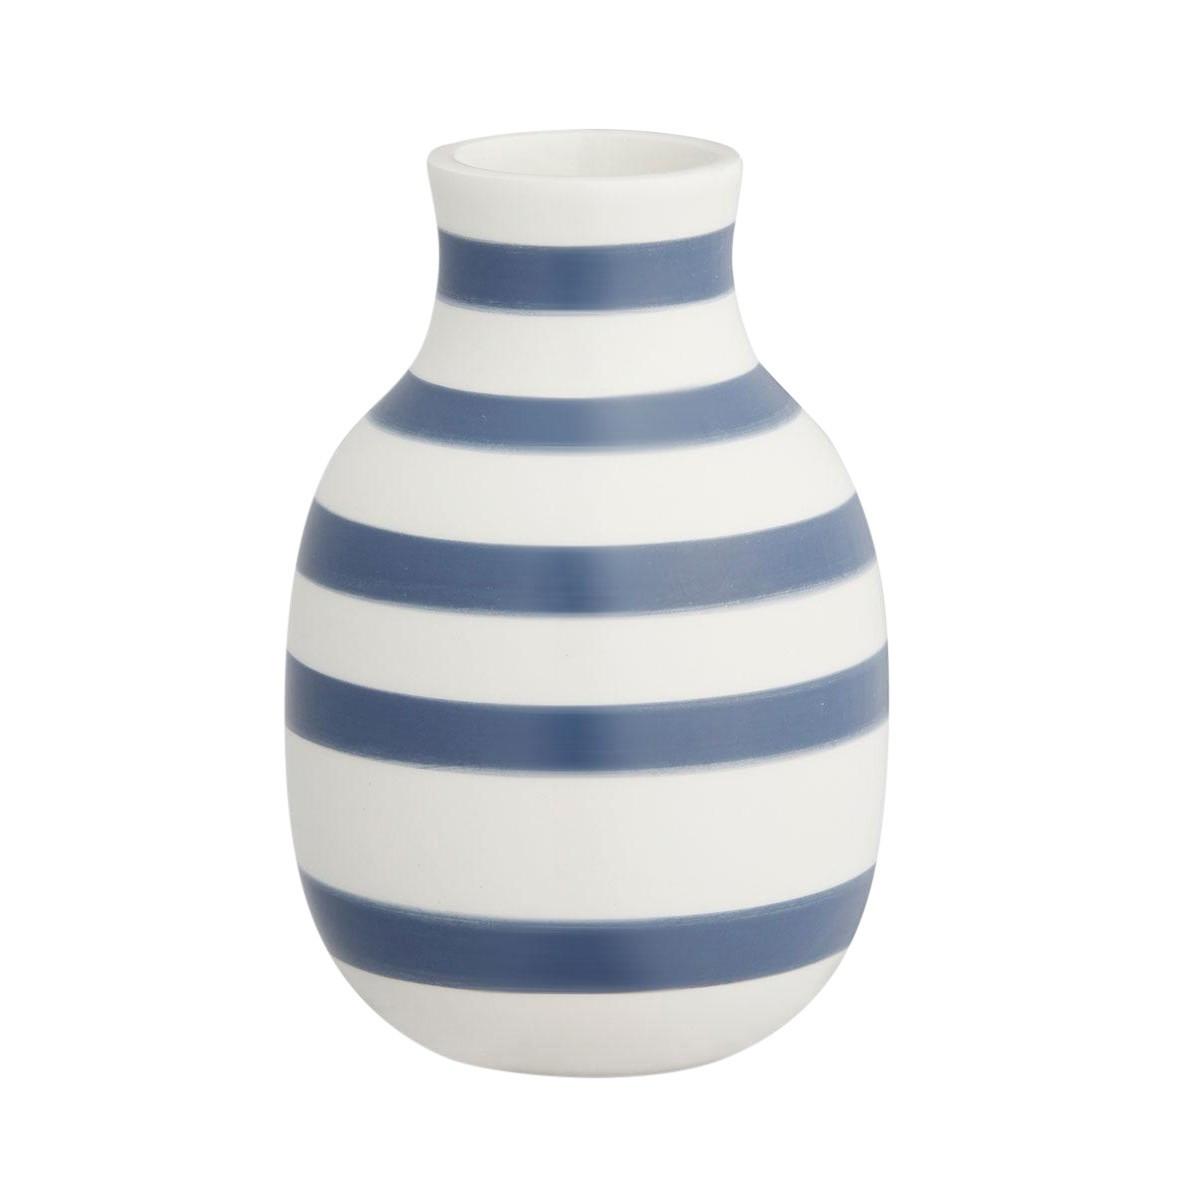 tulip vase for sale of ka¤hler omaggio vase h 12 5cm ambientedirect regarding kaehler omaggio vase h 12 5cm 1200x1200 id1921281 bbdf8a04da4e72bde5efff5fa2586947